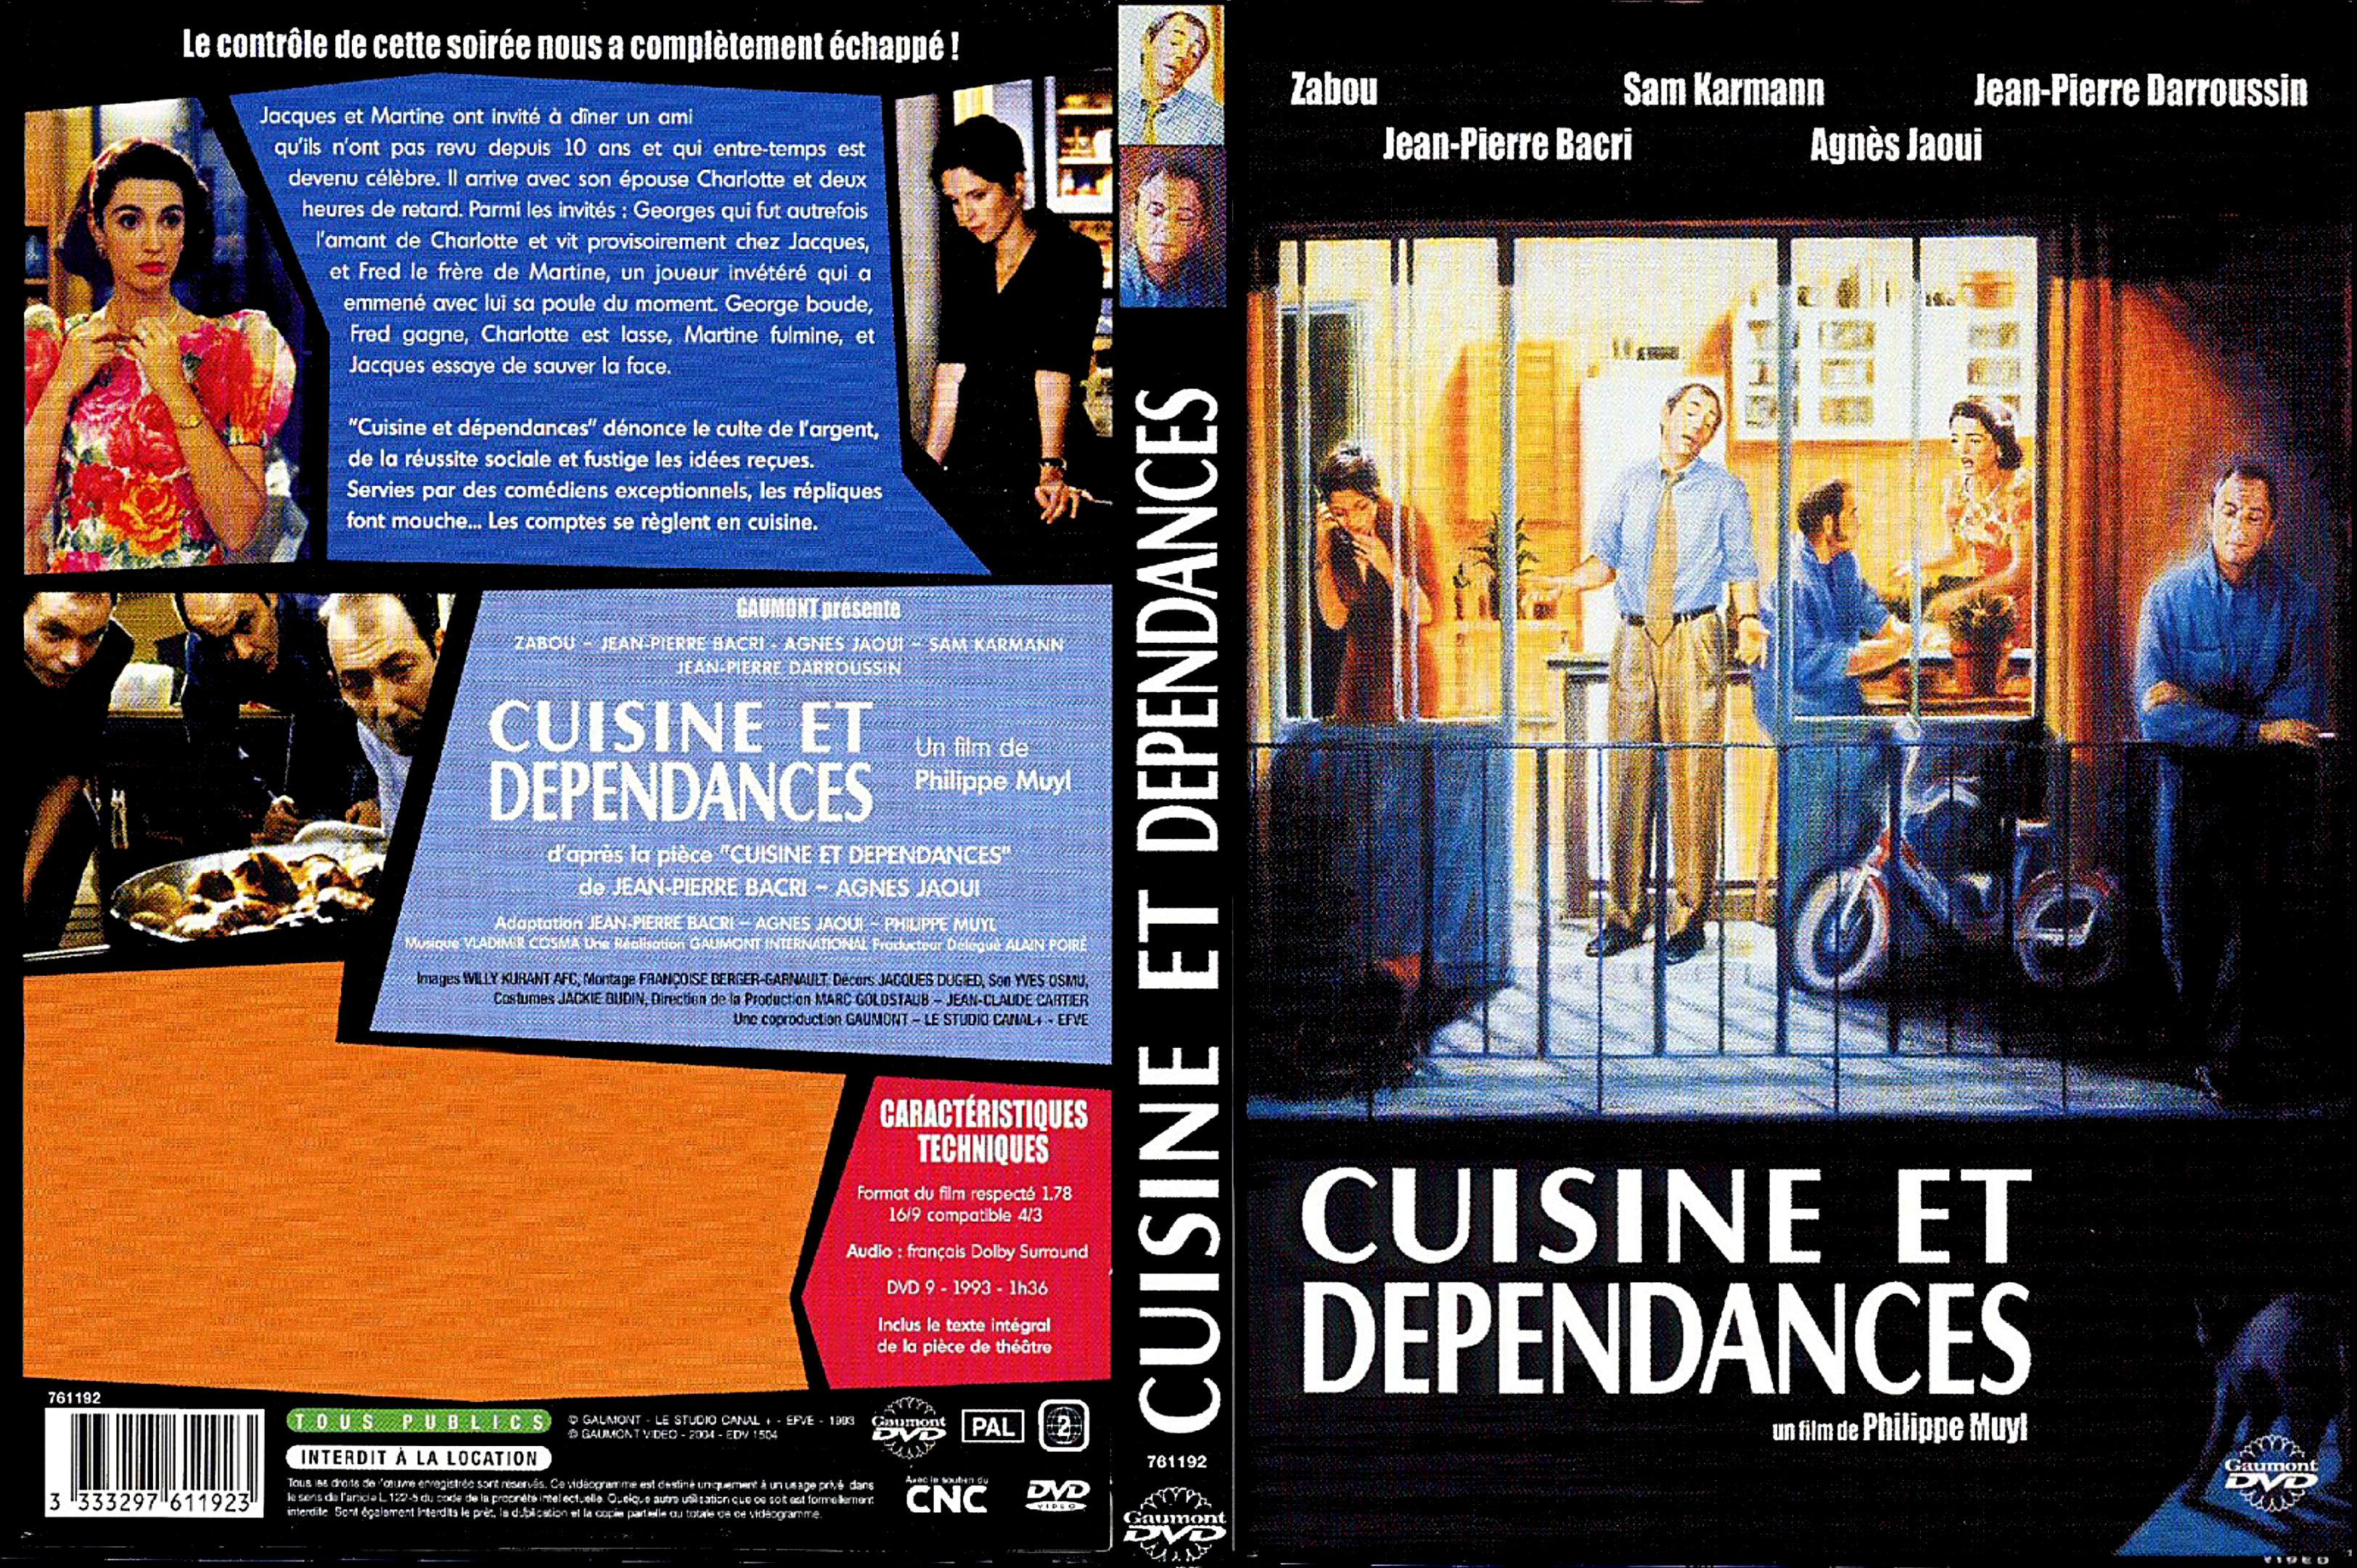 Cuisine Et Dependancesjpg - Cuisines et dependances